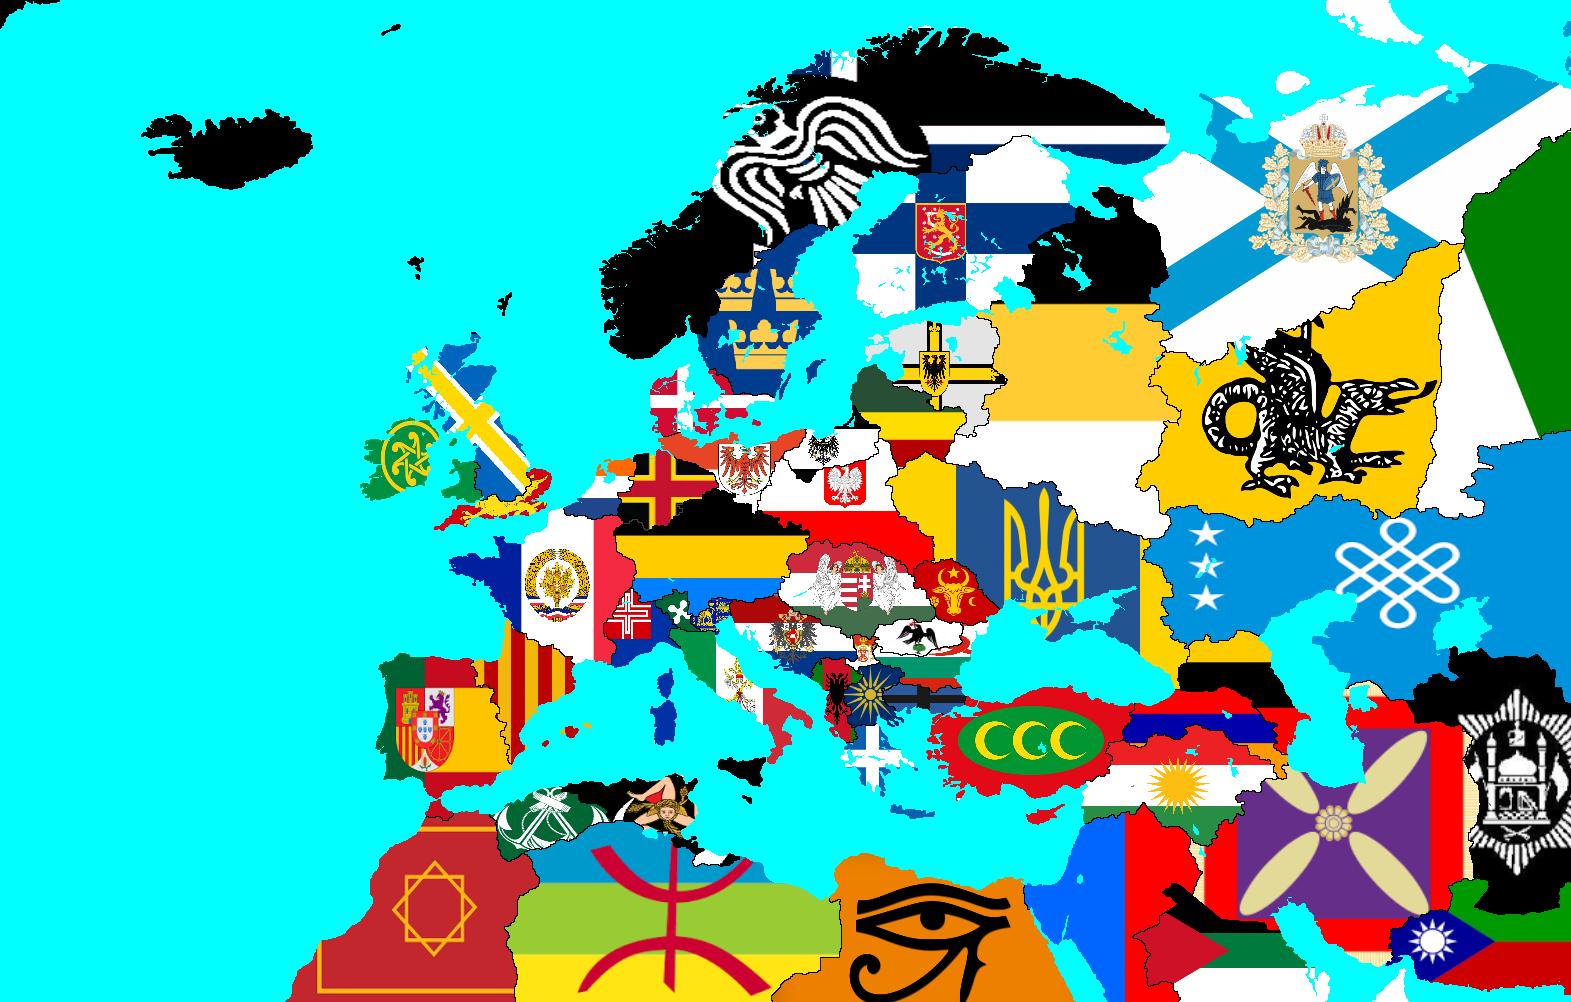 alternate map of europe Image result for alternate map of europe | Europe map, Alternate